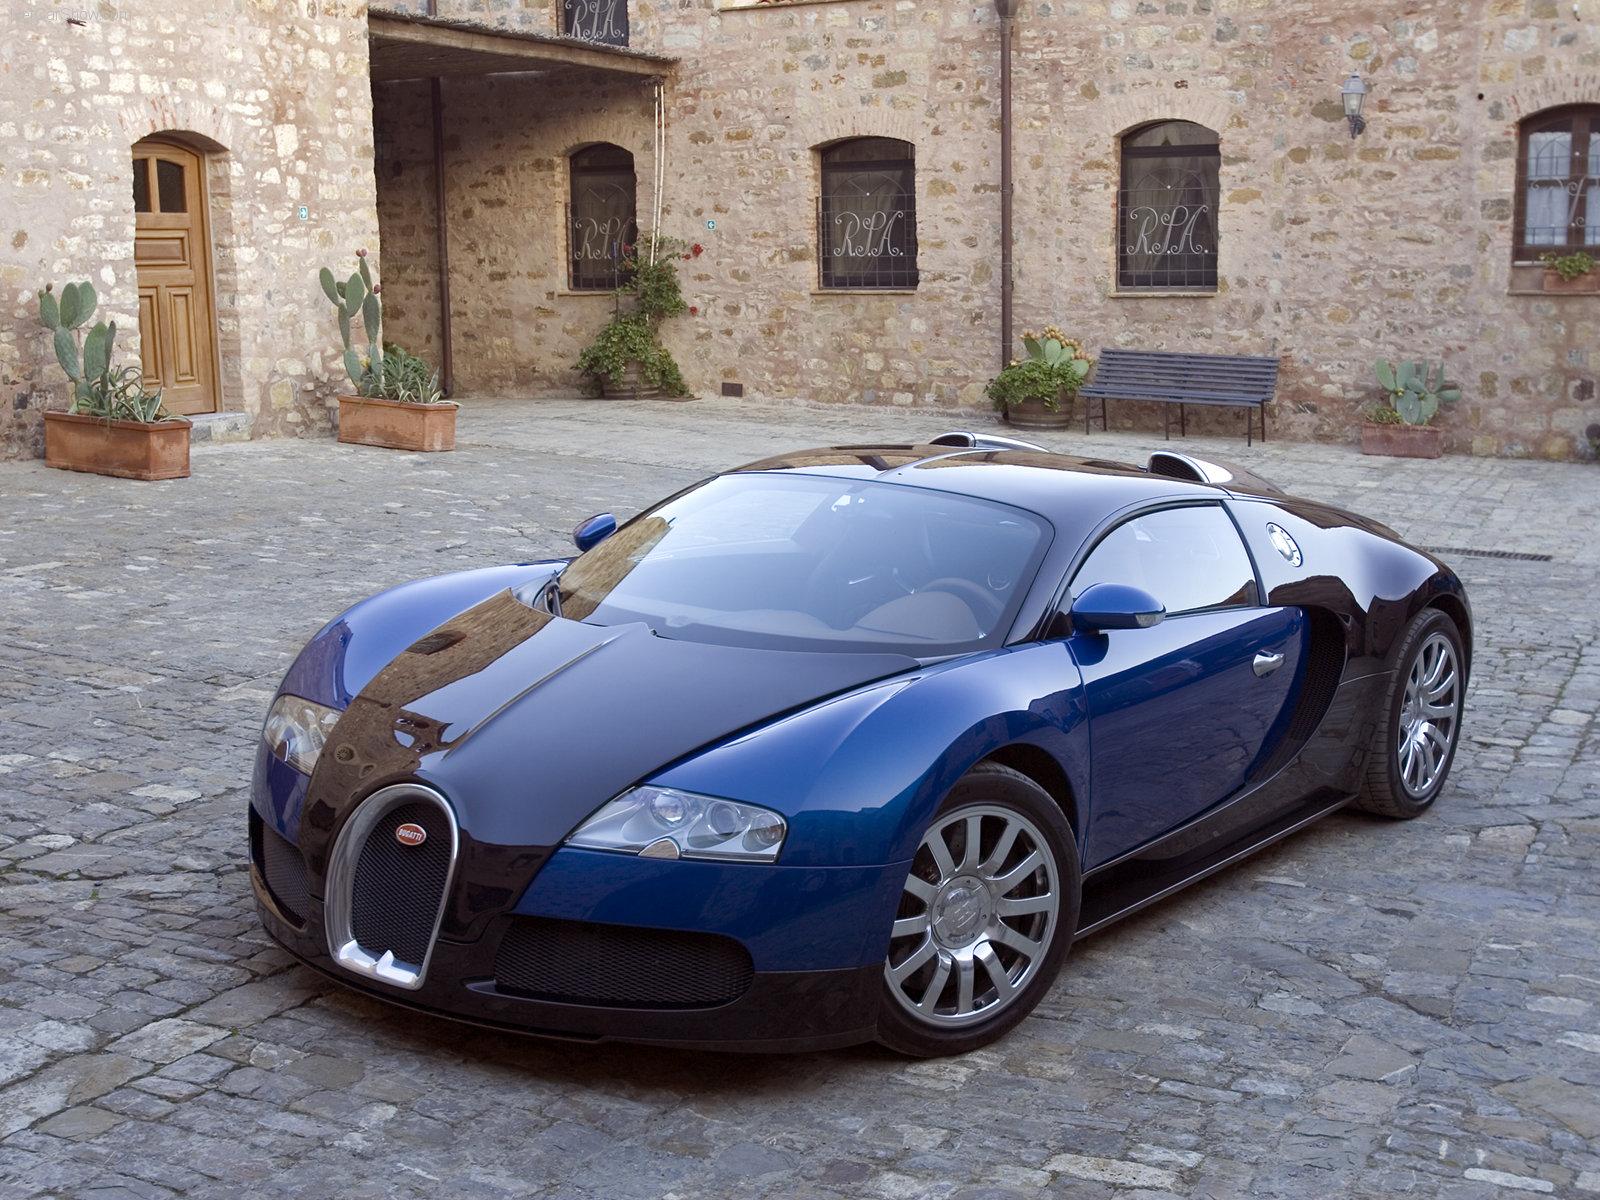 blog stagespointspermis la bugatti veyron 16 4 le prix. Black Bedroom Furniture Sets. Home Design Ideas